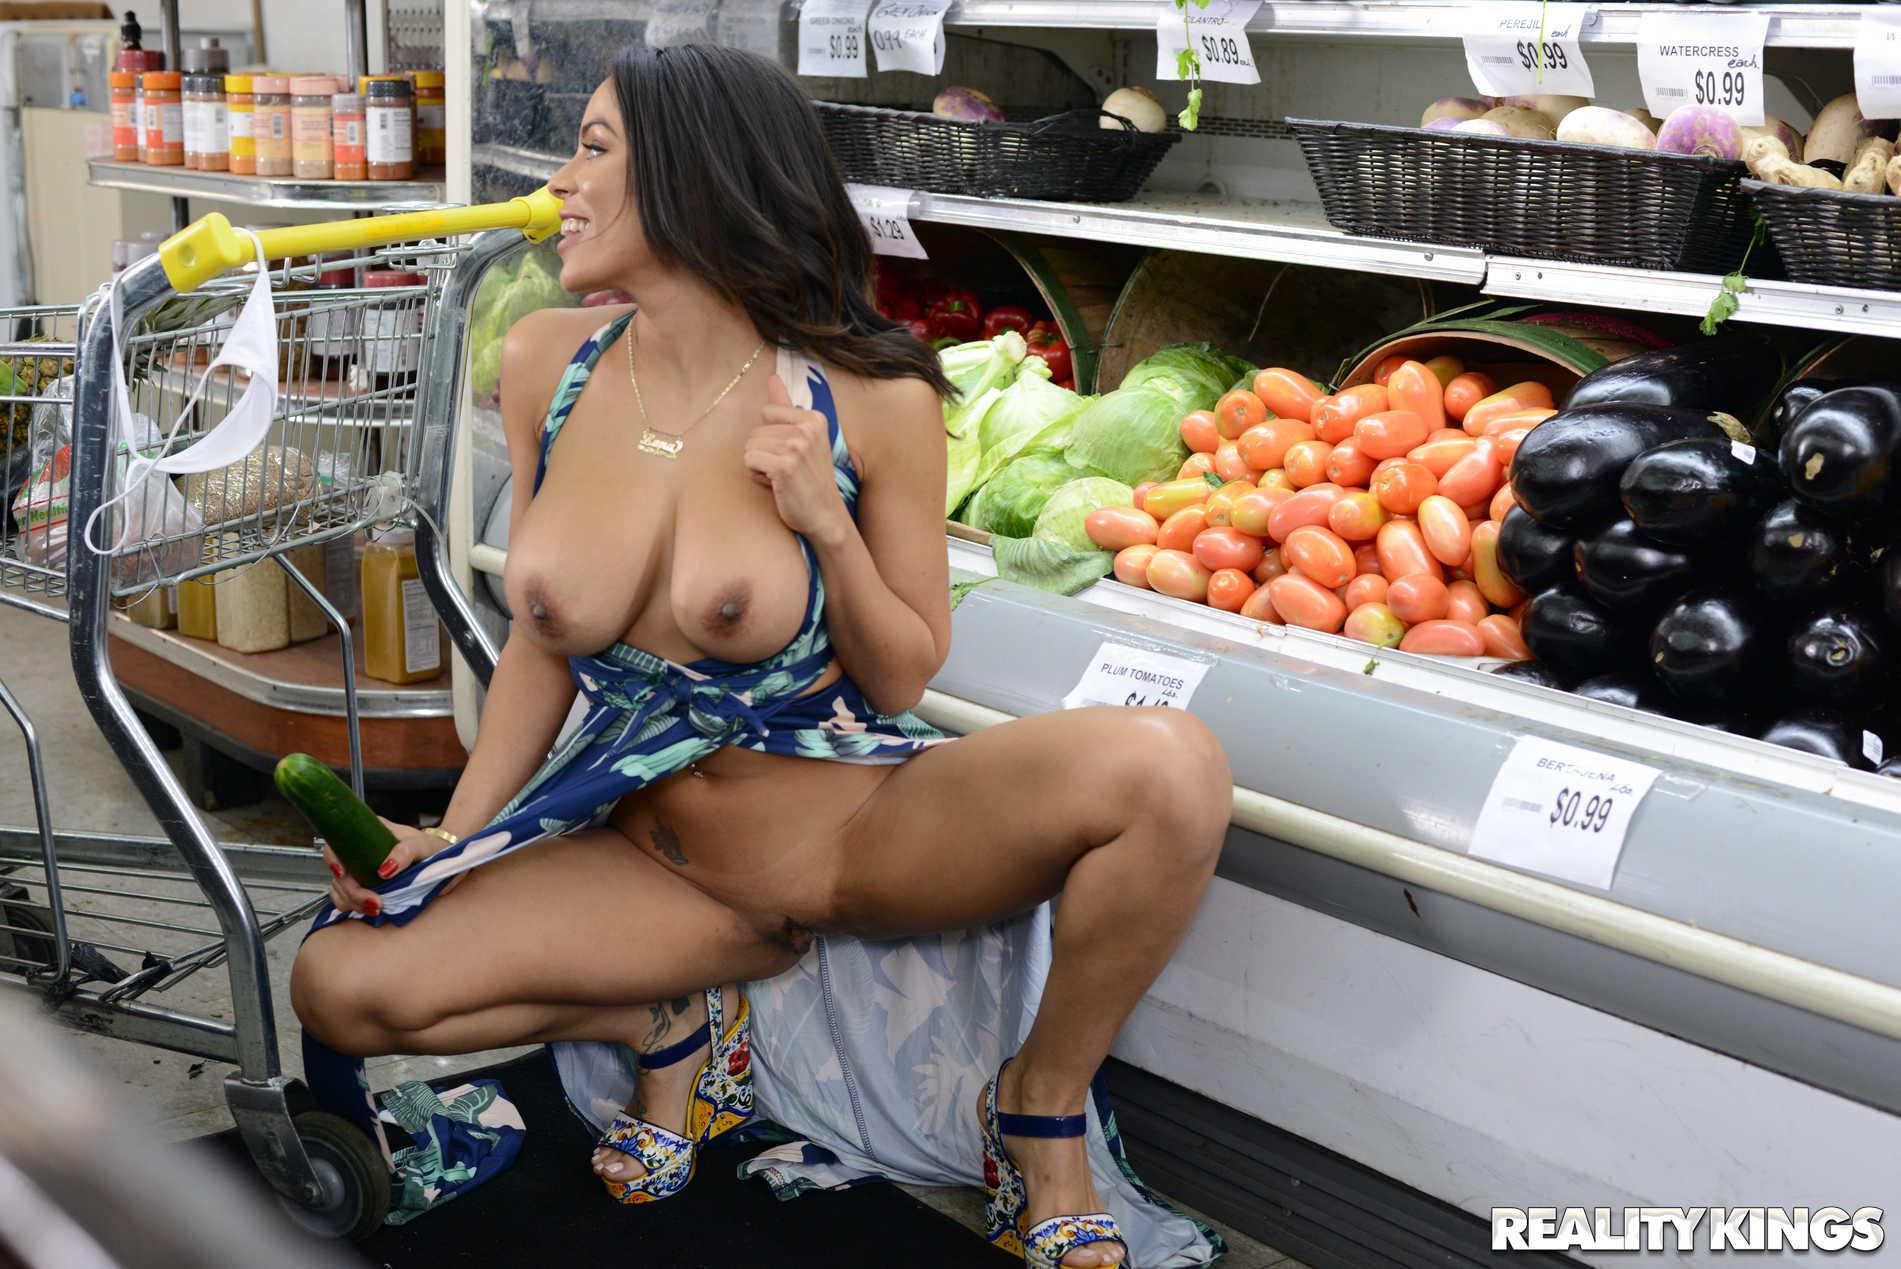 Milf cockteasing in grocery store, sex videos of tamil girls